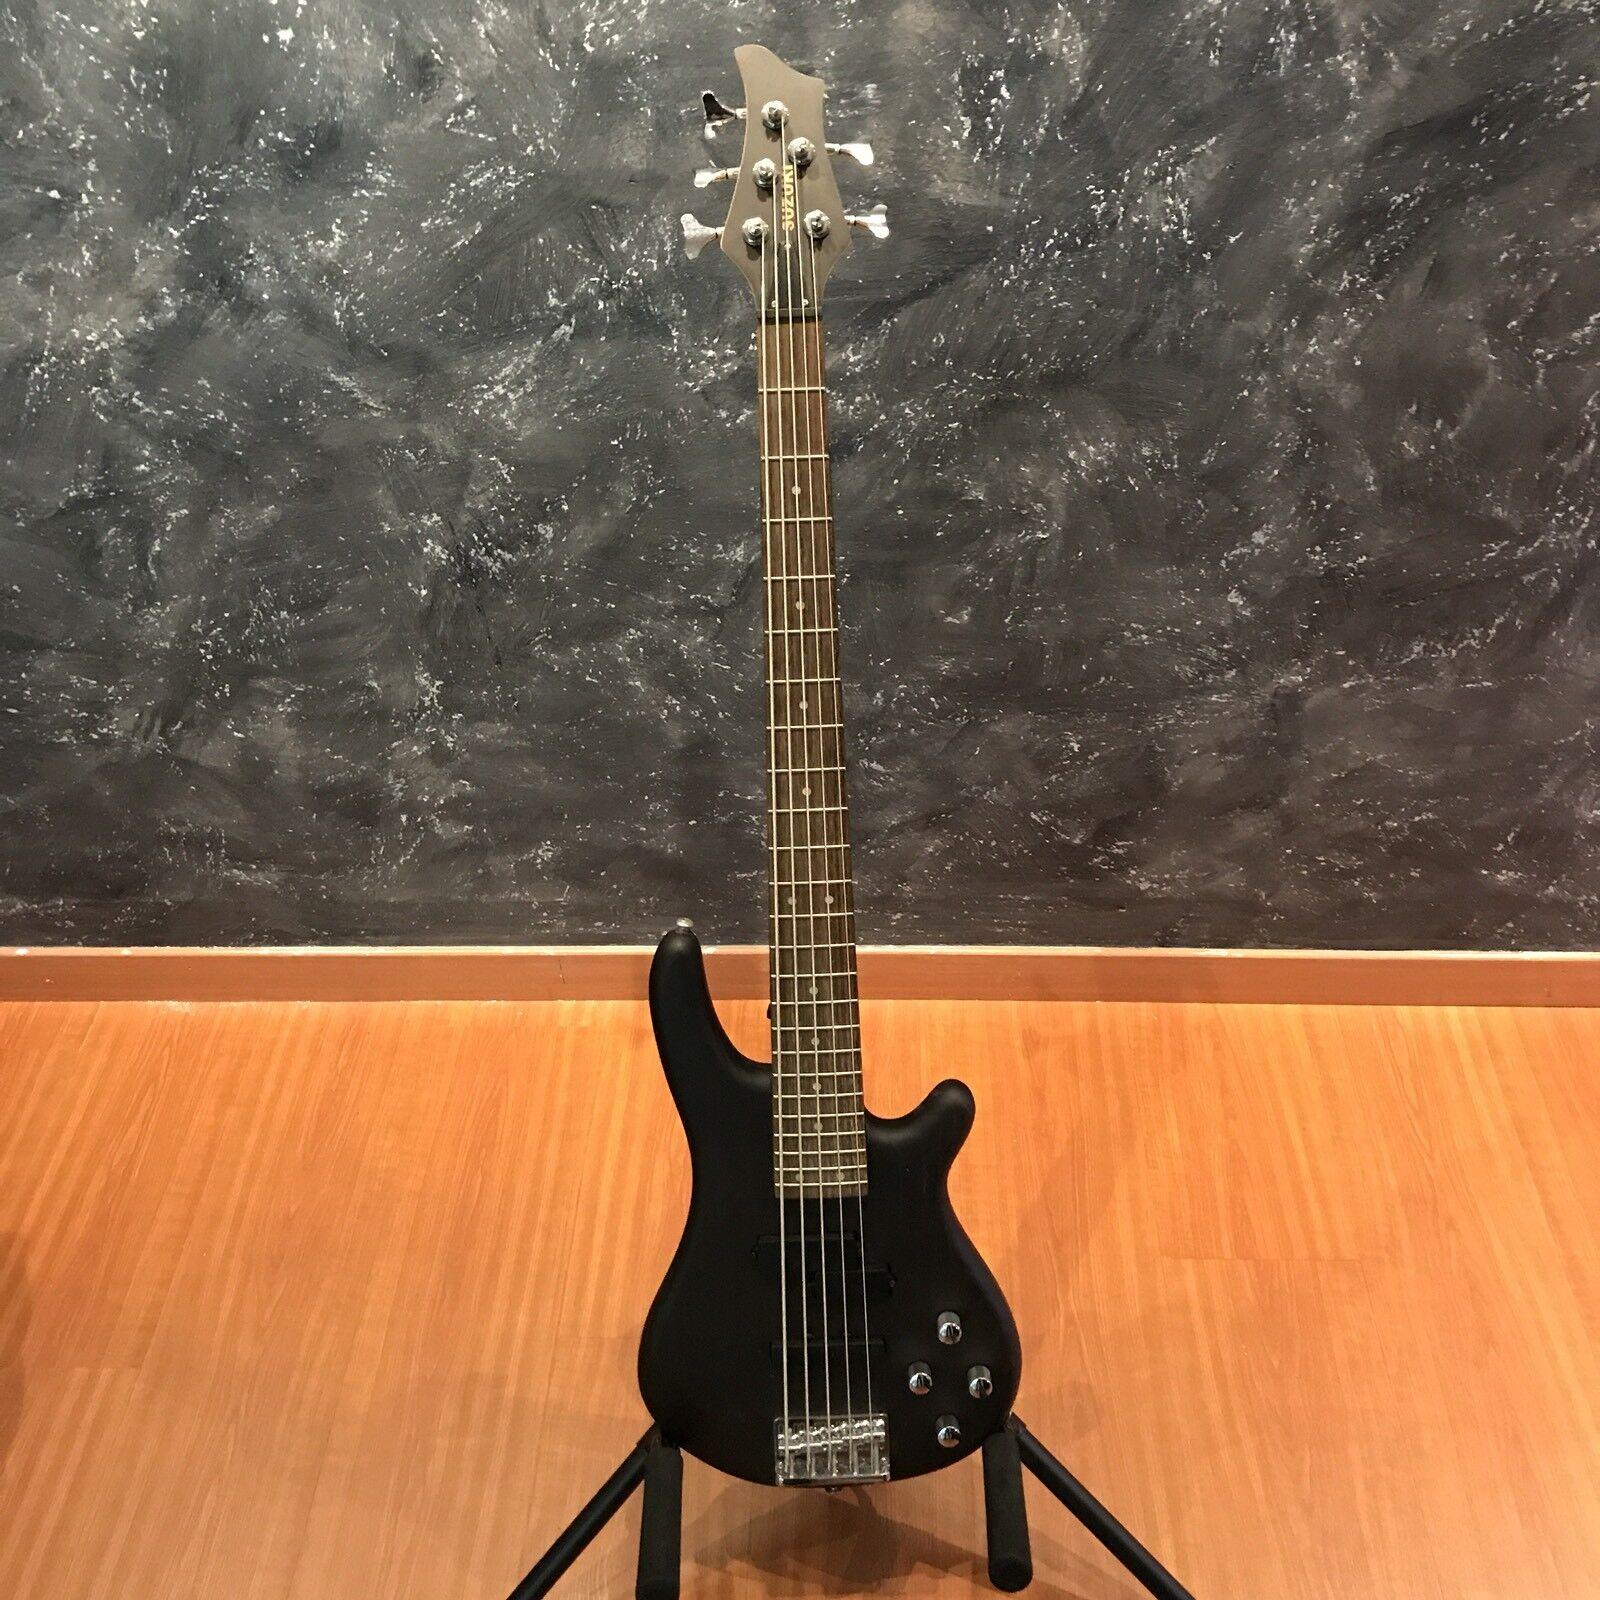 Suzuki SBA-10 5 BK10 5 String Bass Guitar